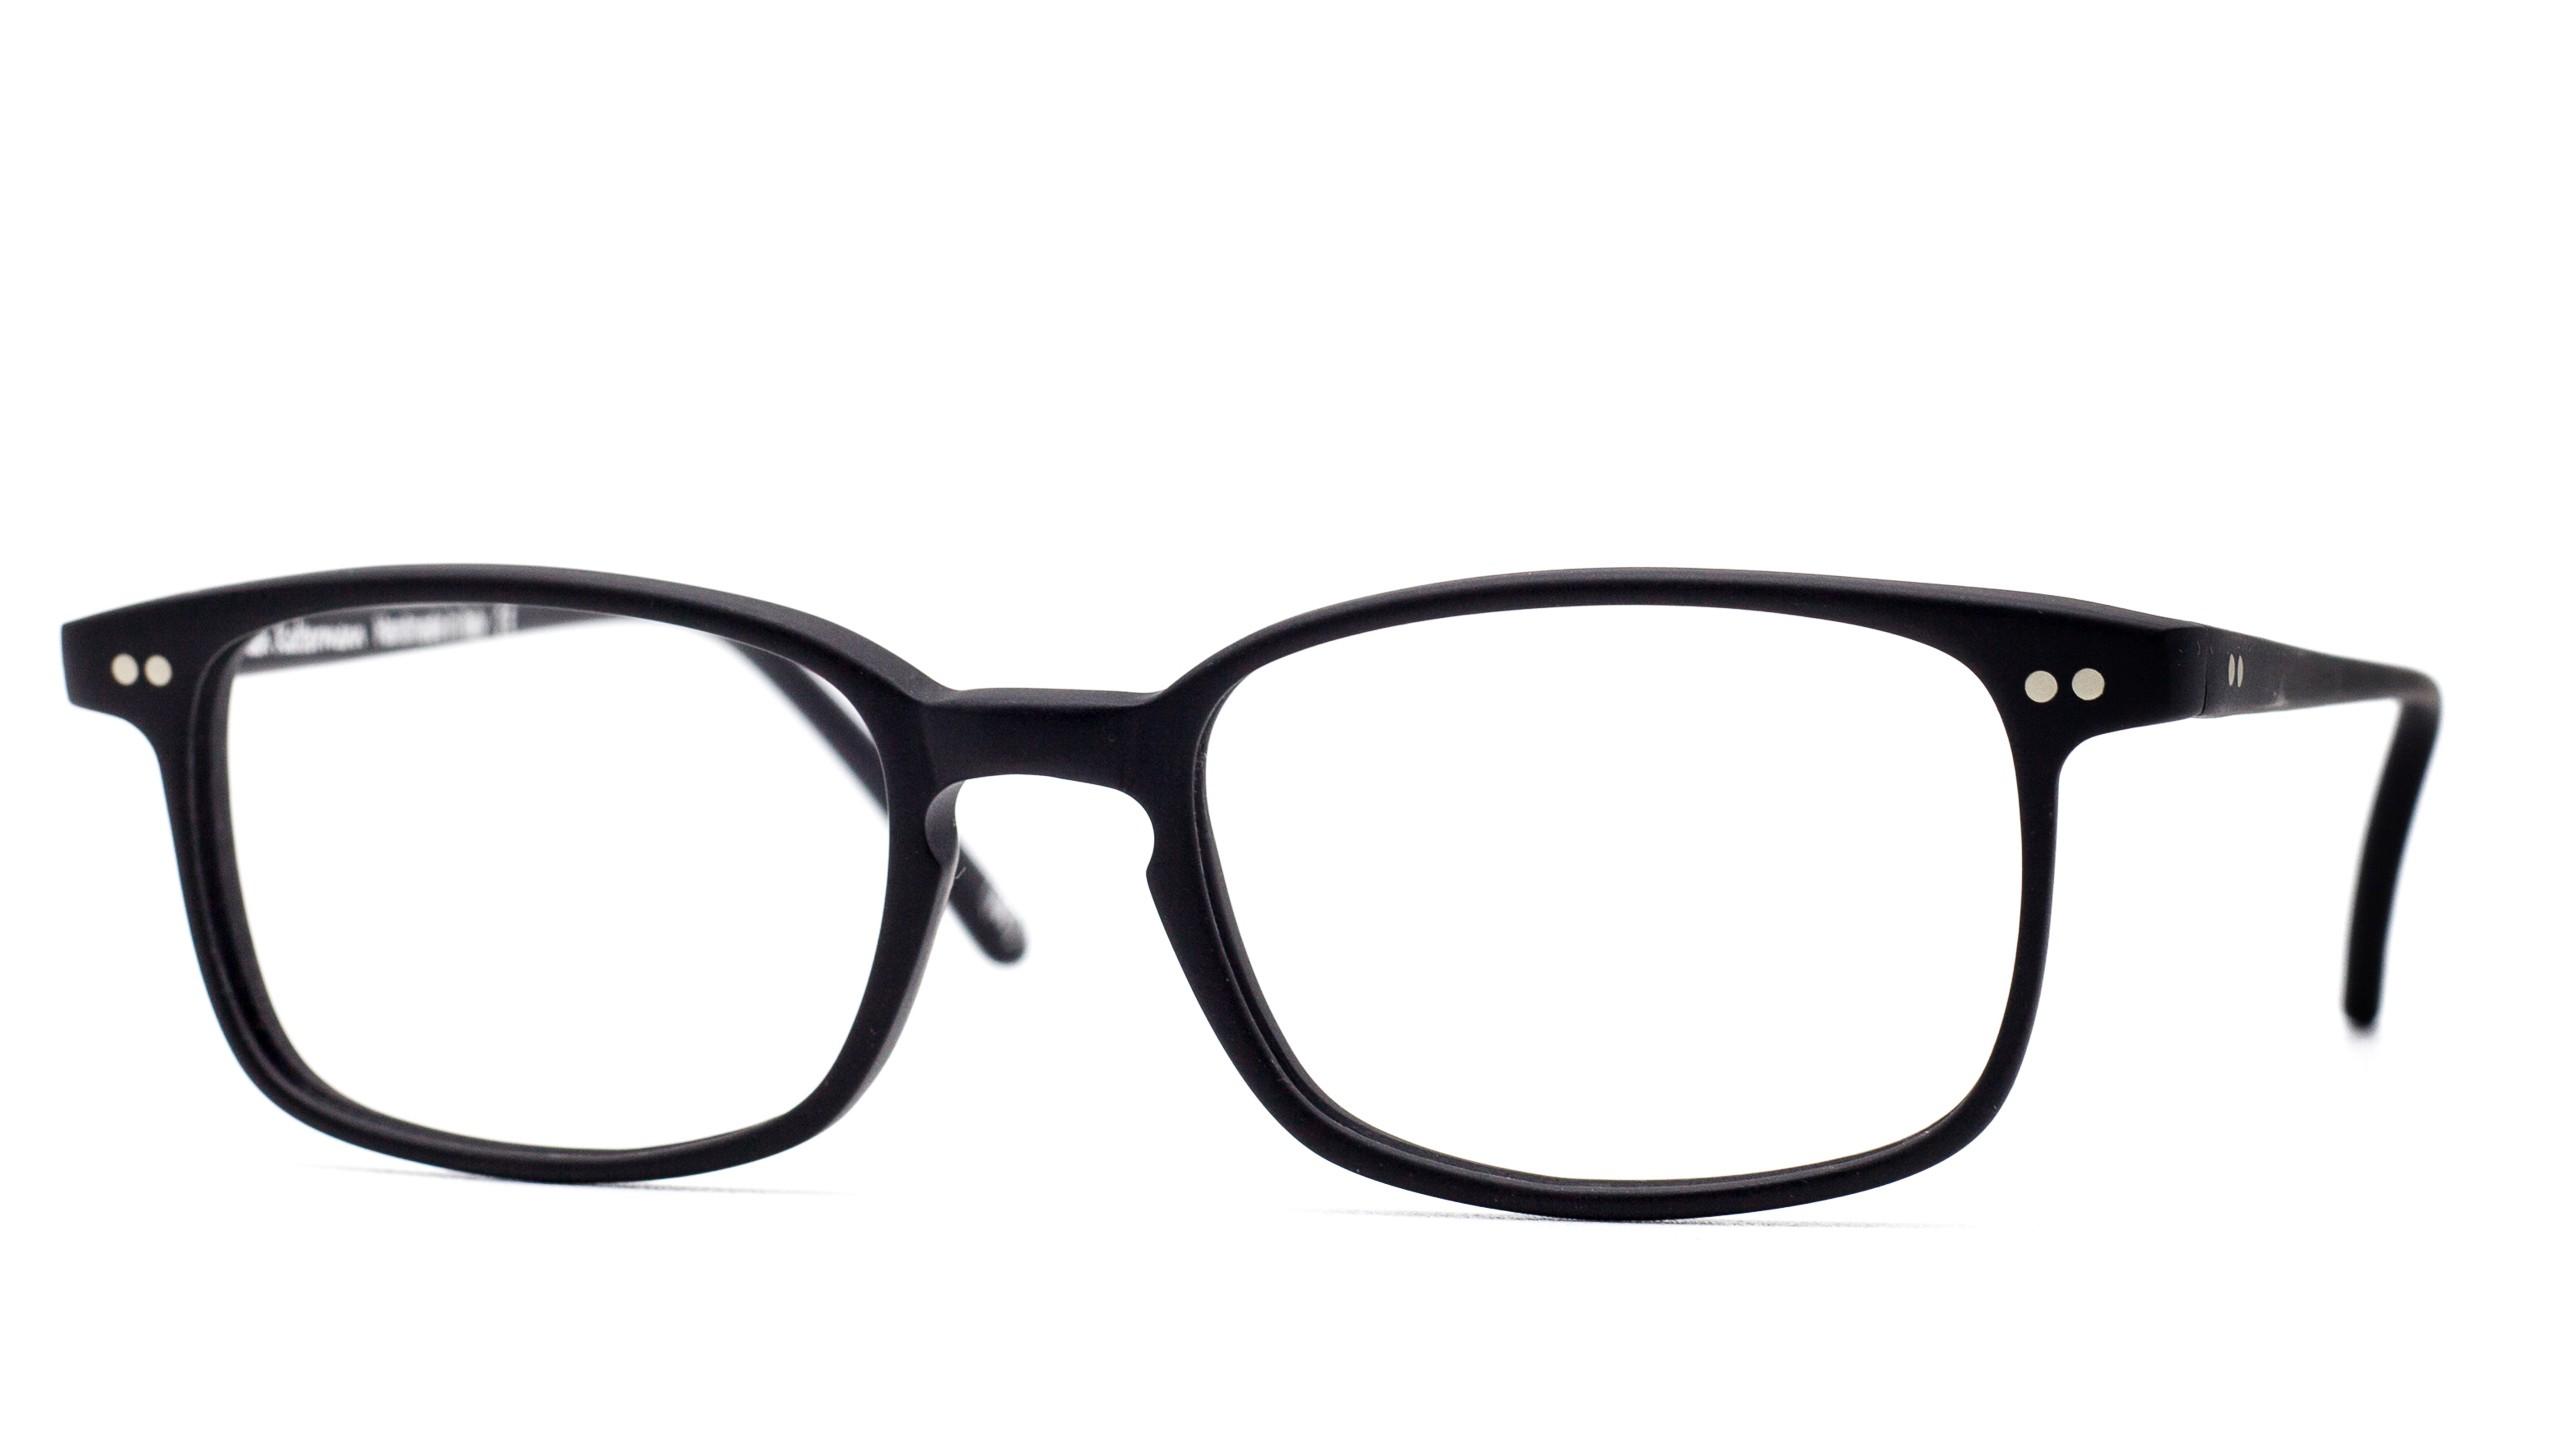 eyeglasses-Nathan-Kaltermann-made-in-Italy-Eddy-C01M-Vista2